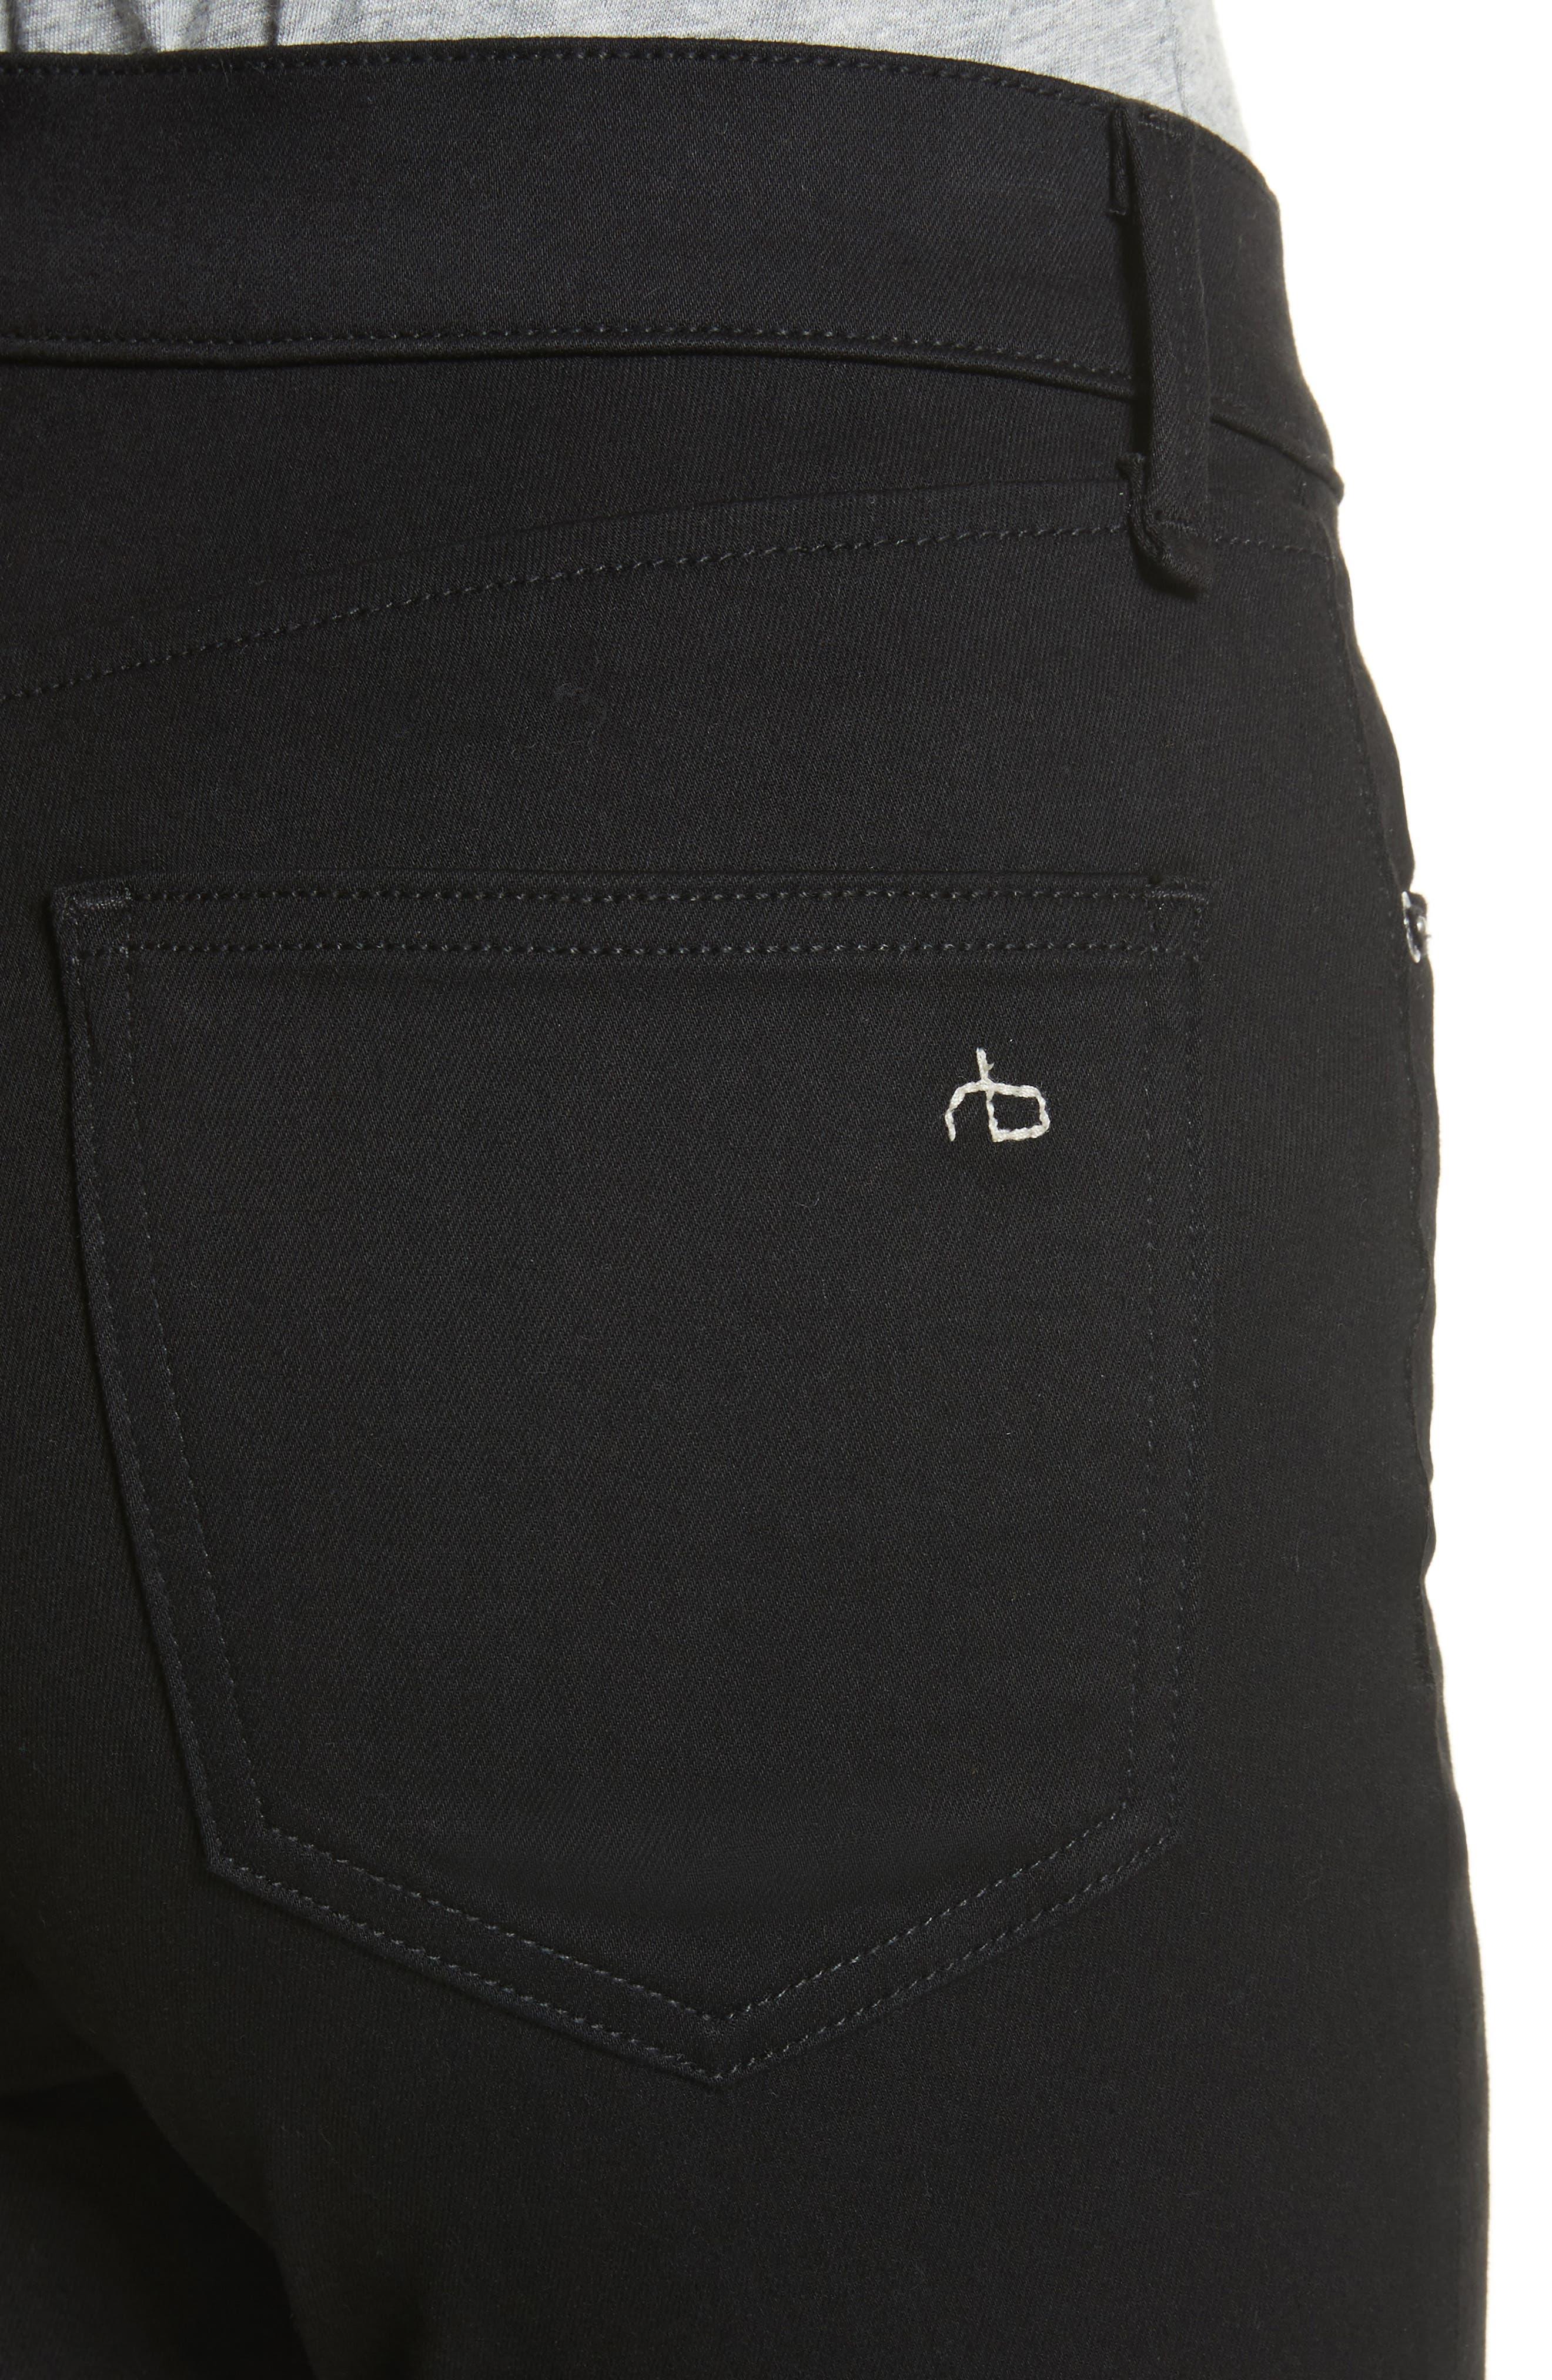 Isabel High Waist Skinny Jeans,                             Alternate thumbnail 4, color,                             Black